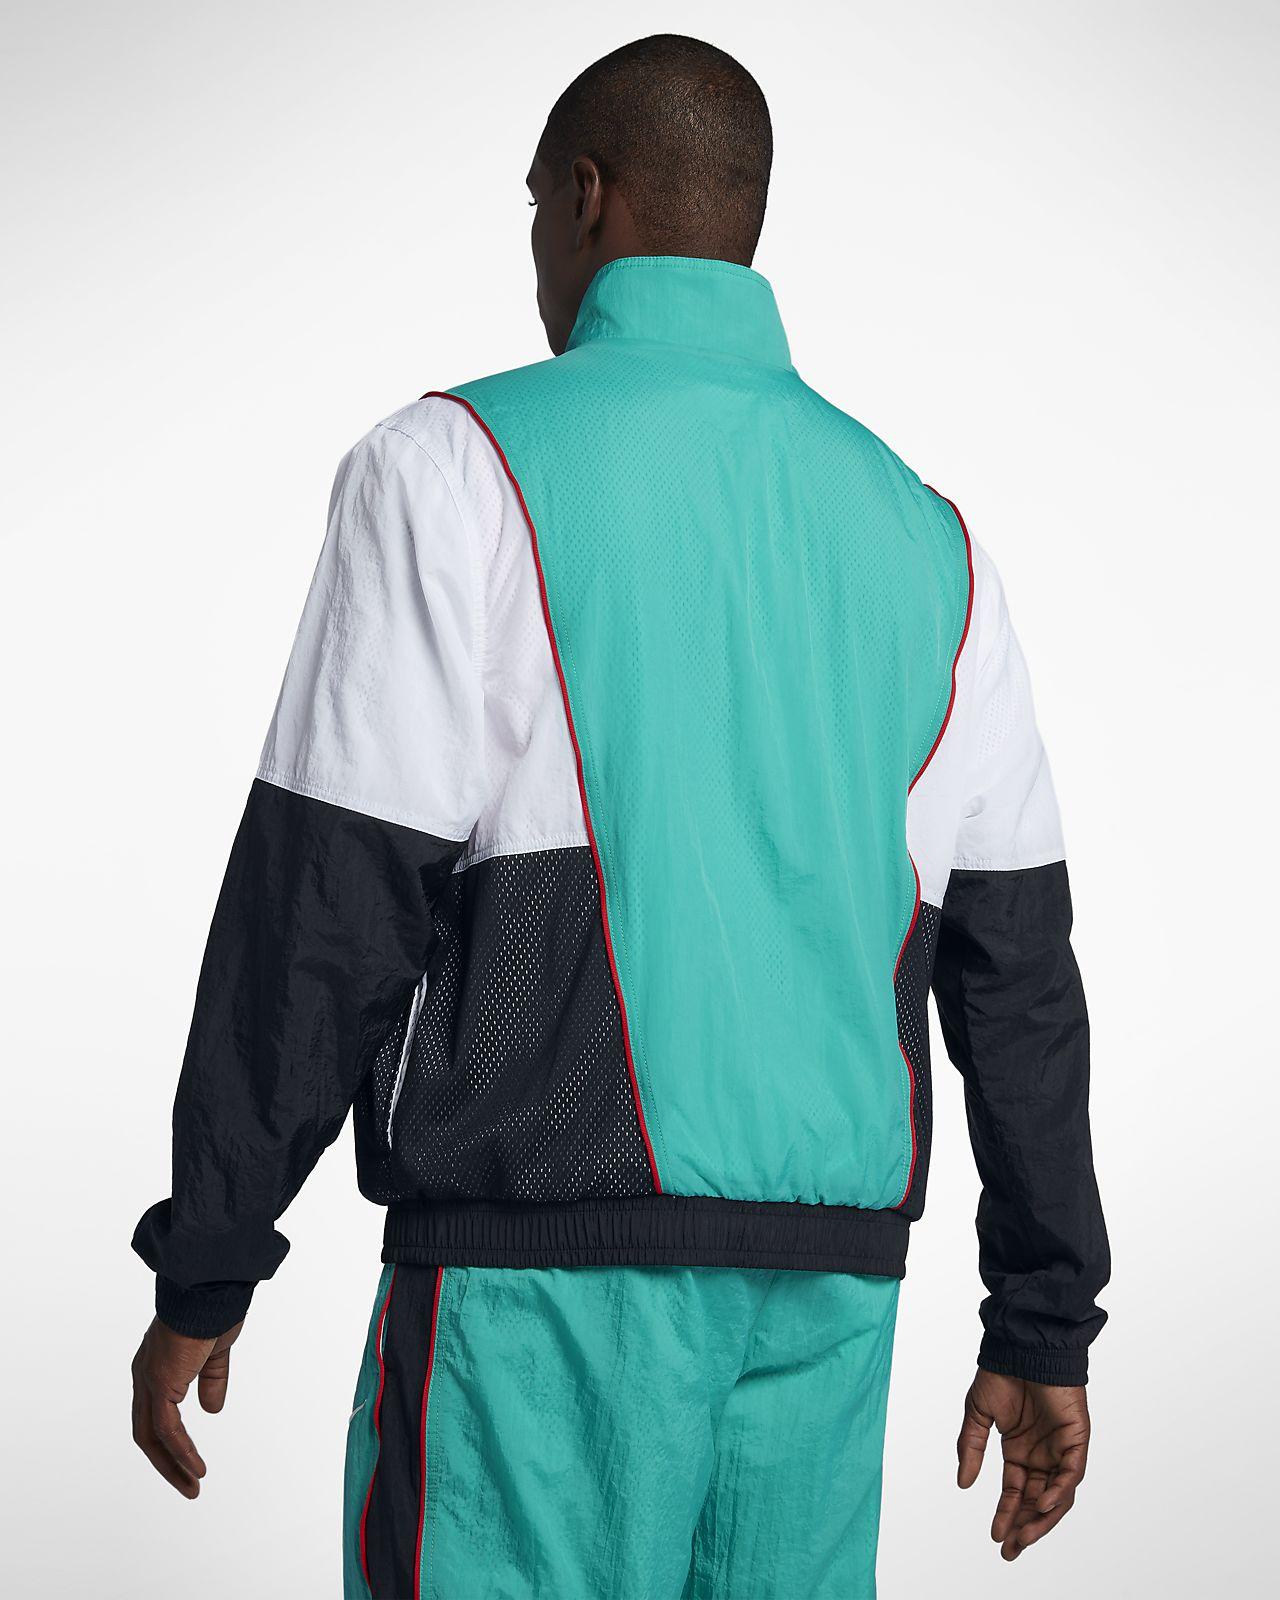 caae70fe6931 Nike Throwback Men s Tracksuit Basketball Jacket. Nike.com